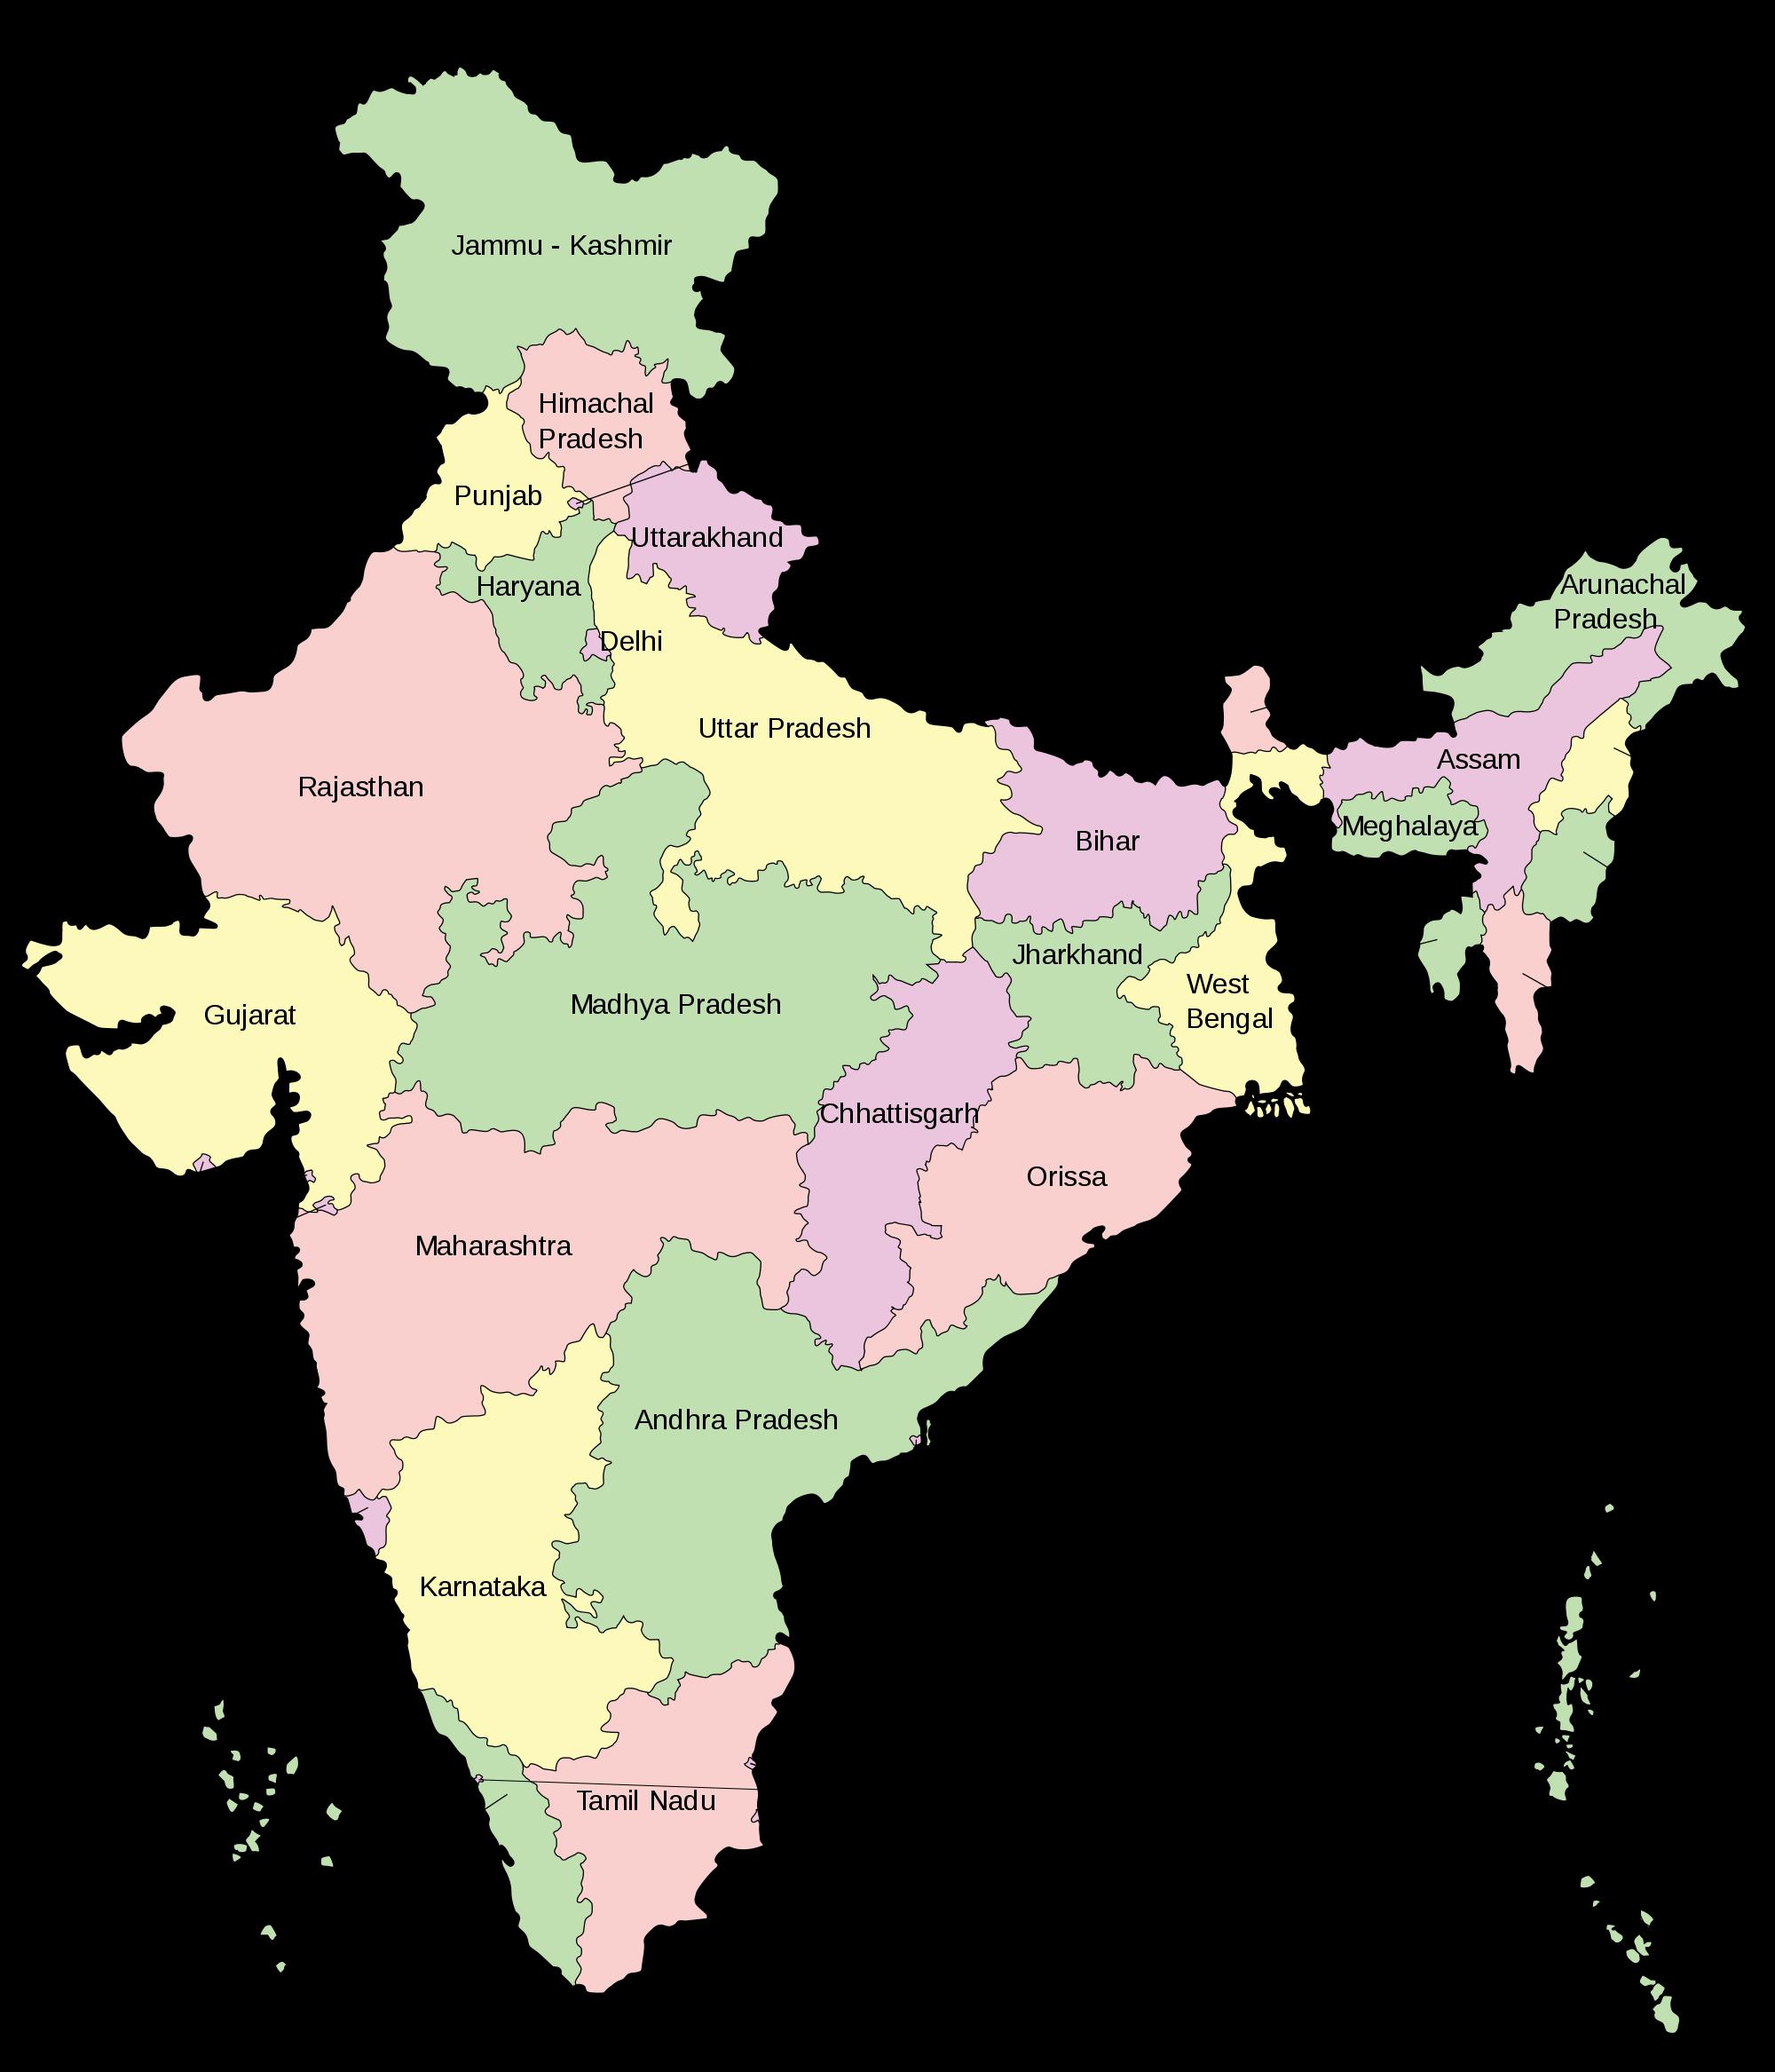 Pin by Kirupa Karan on map | India map, Map, Map outline